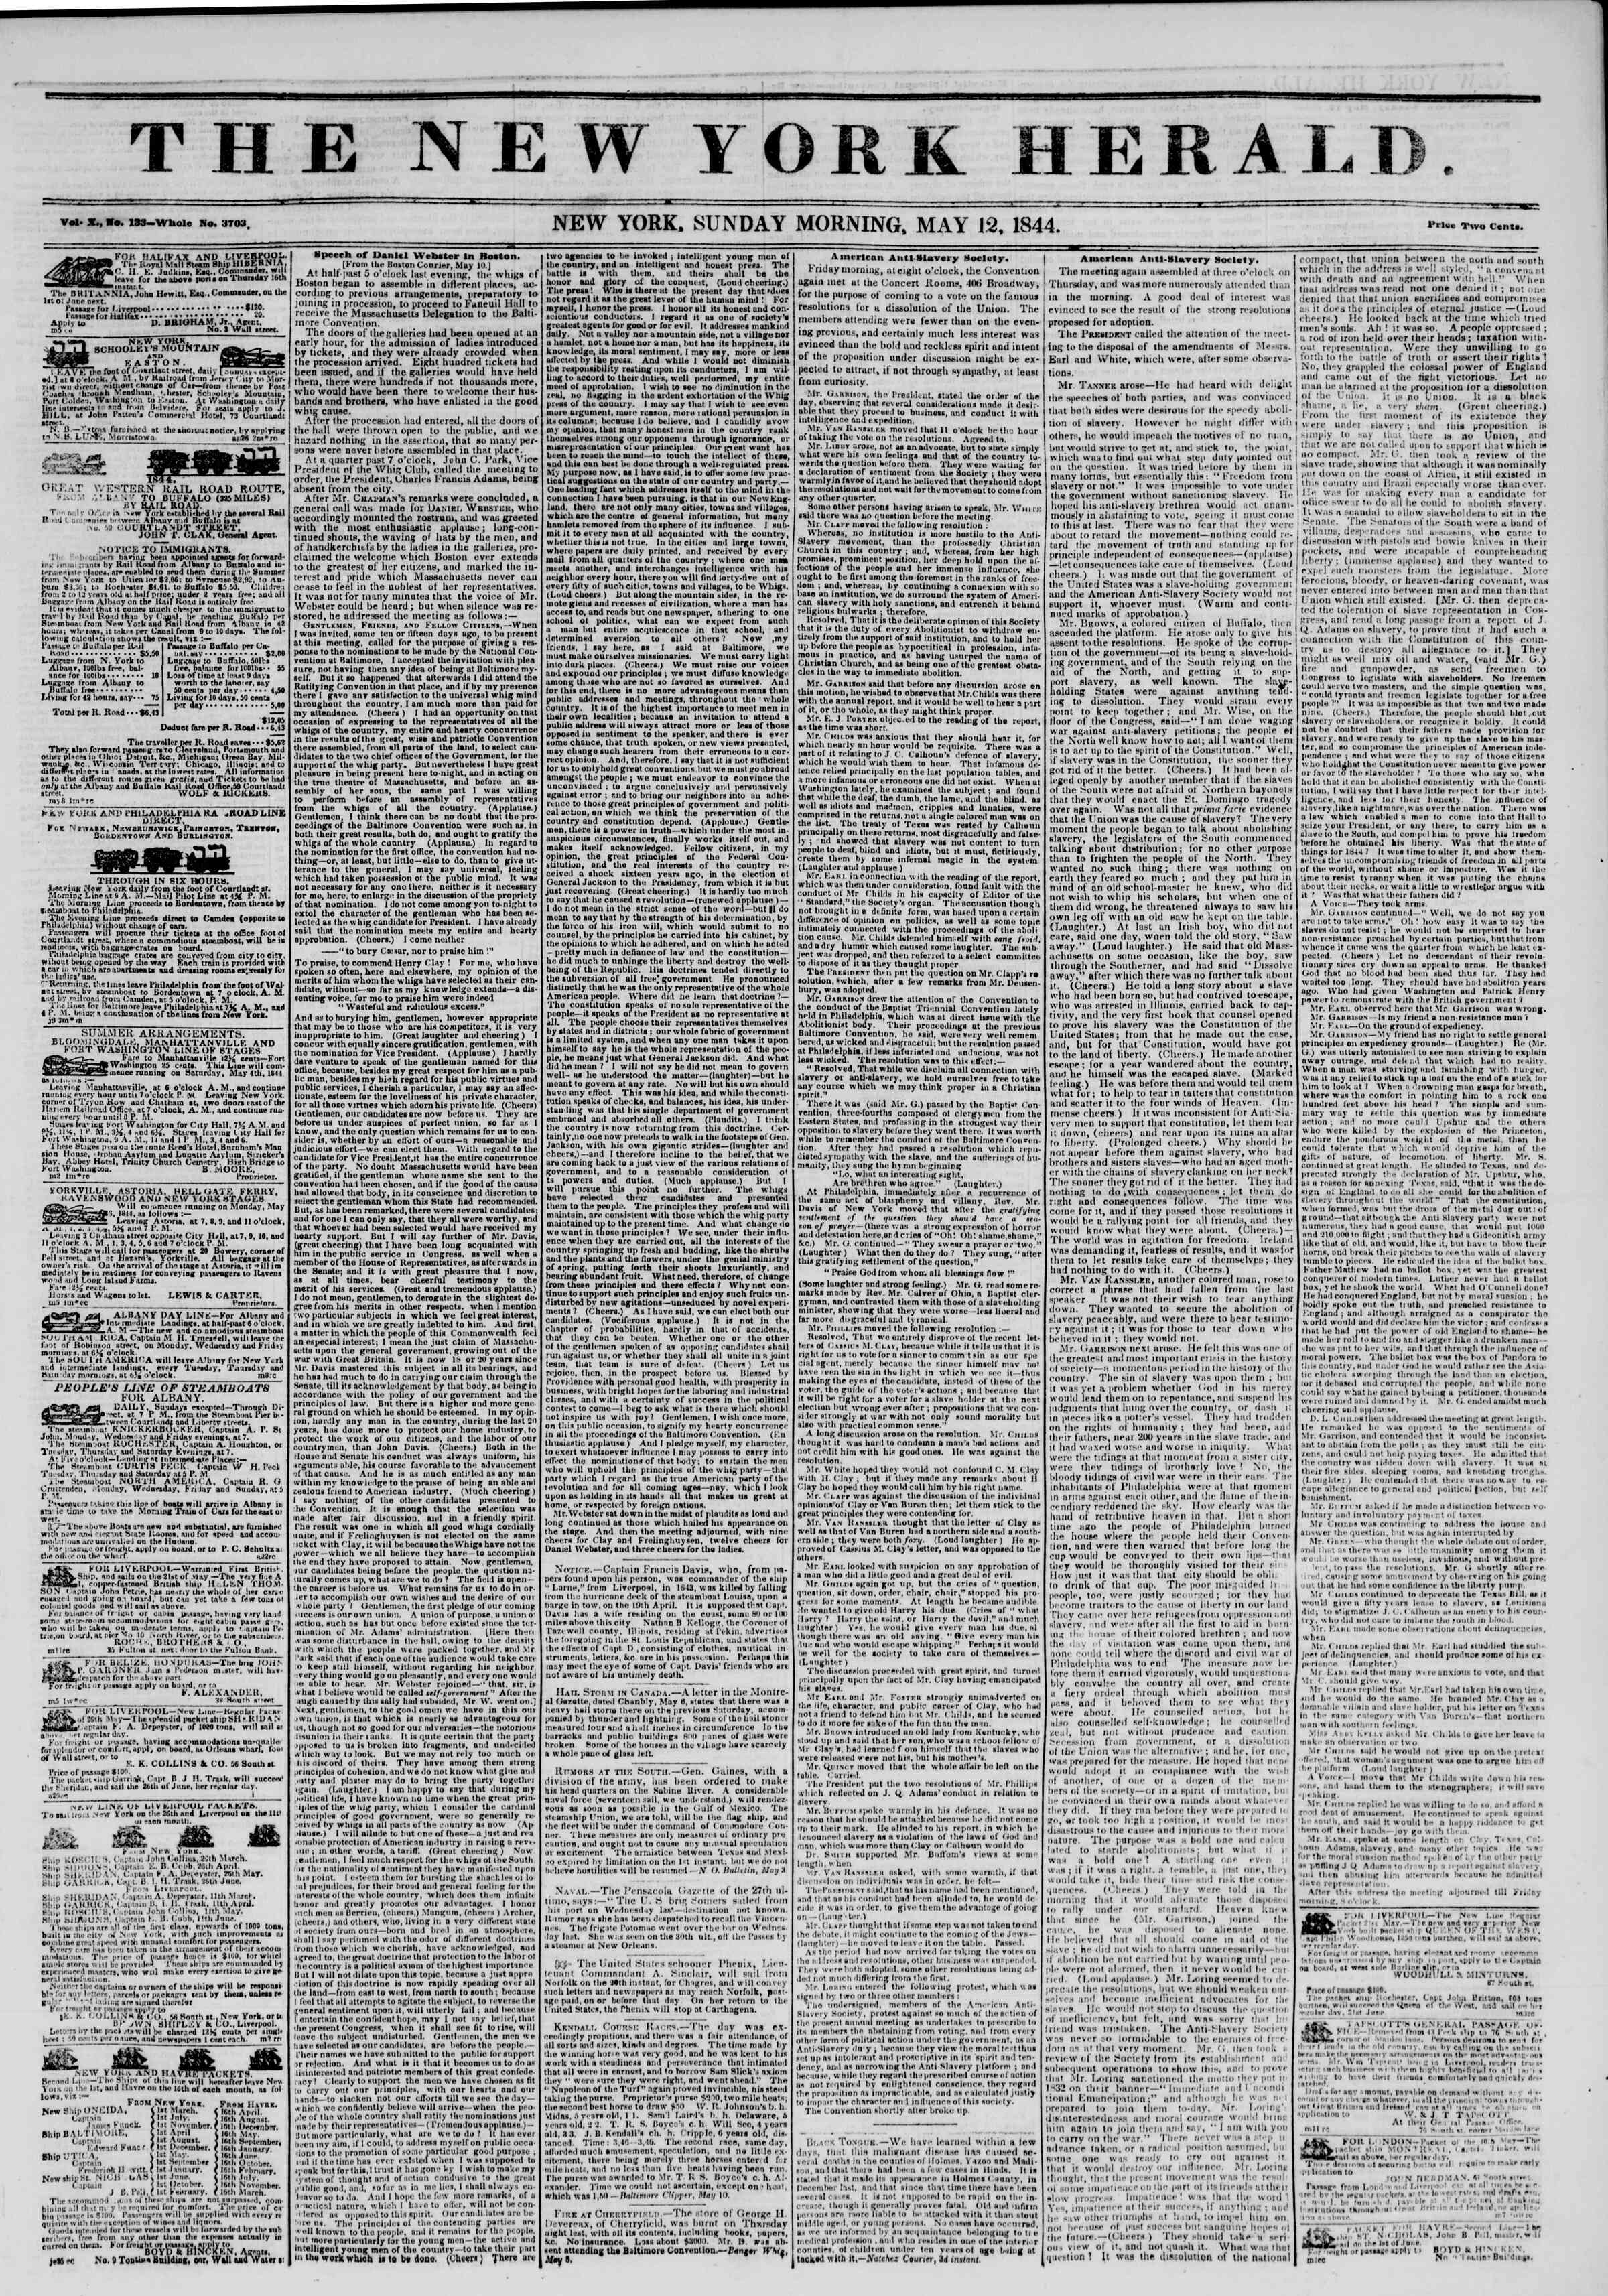 May 12, 1844 Tarihli The New York Herald Gazetesi Sayfa 1